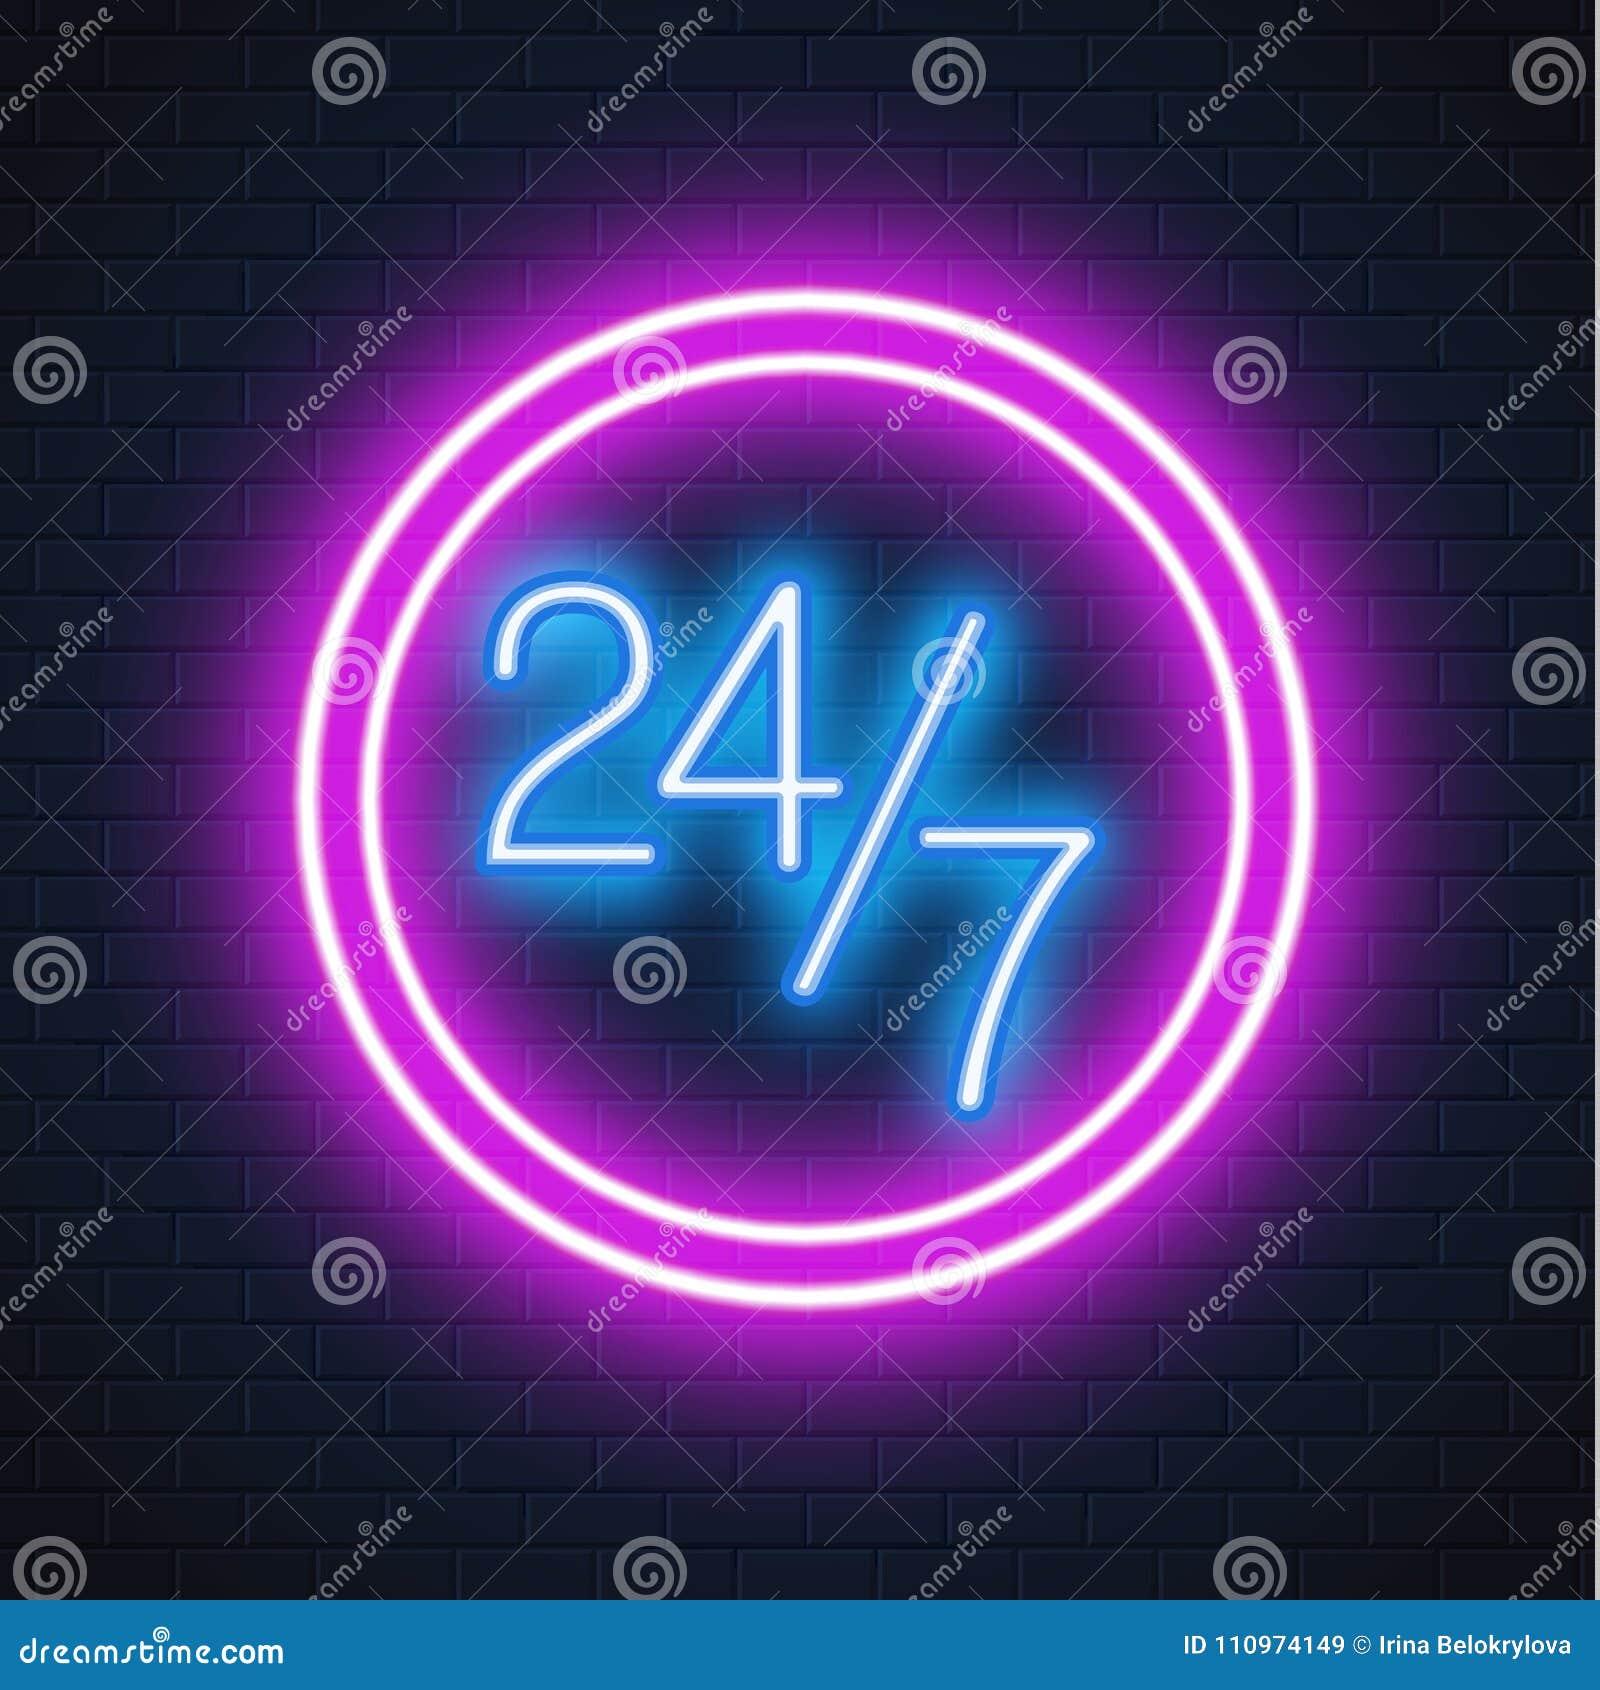 Vector neon 24 7 open sign brick wall